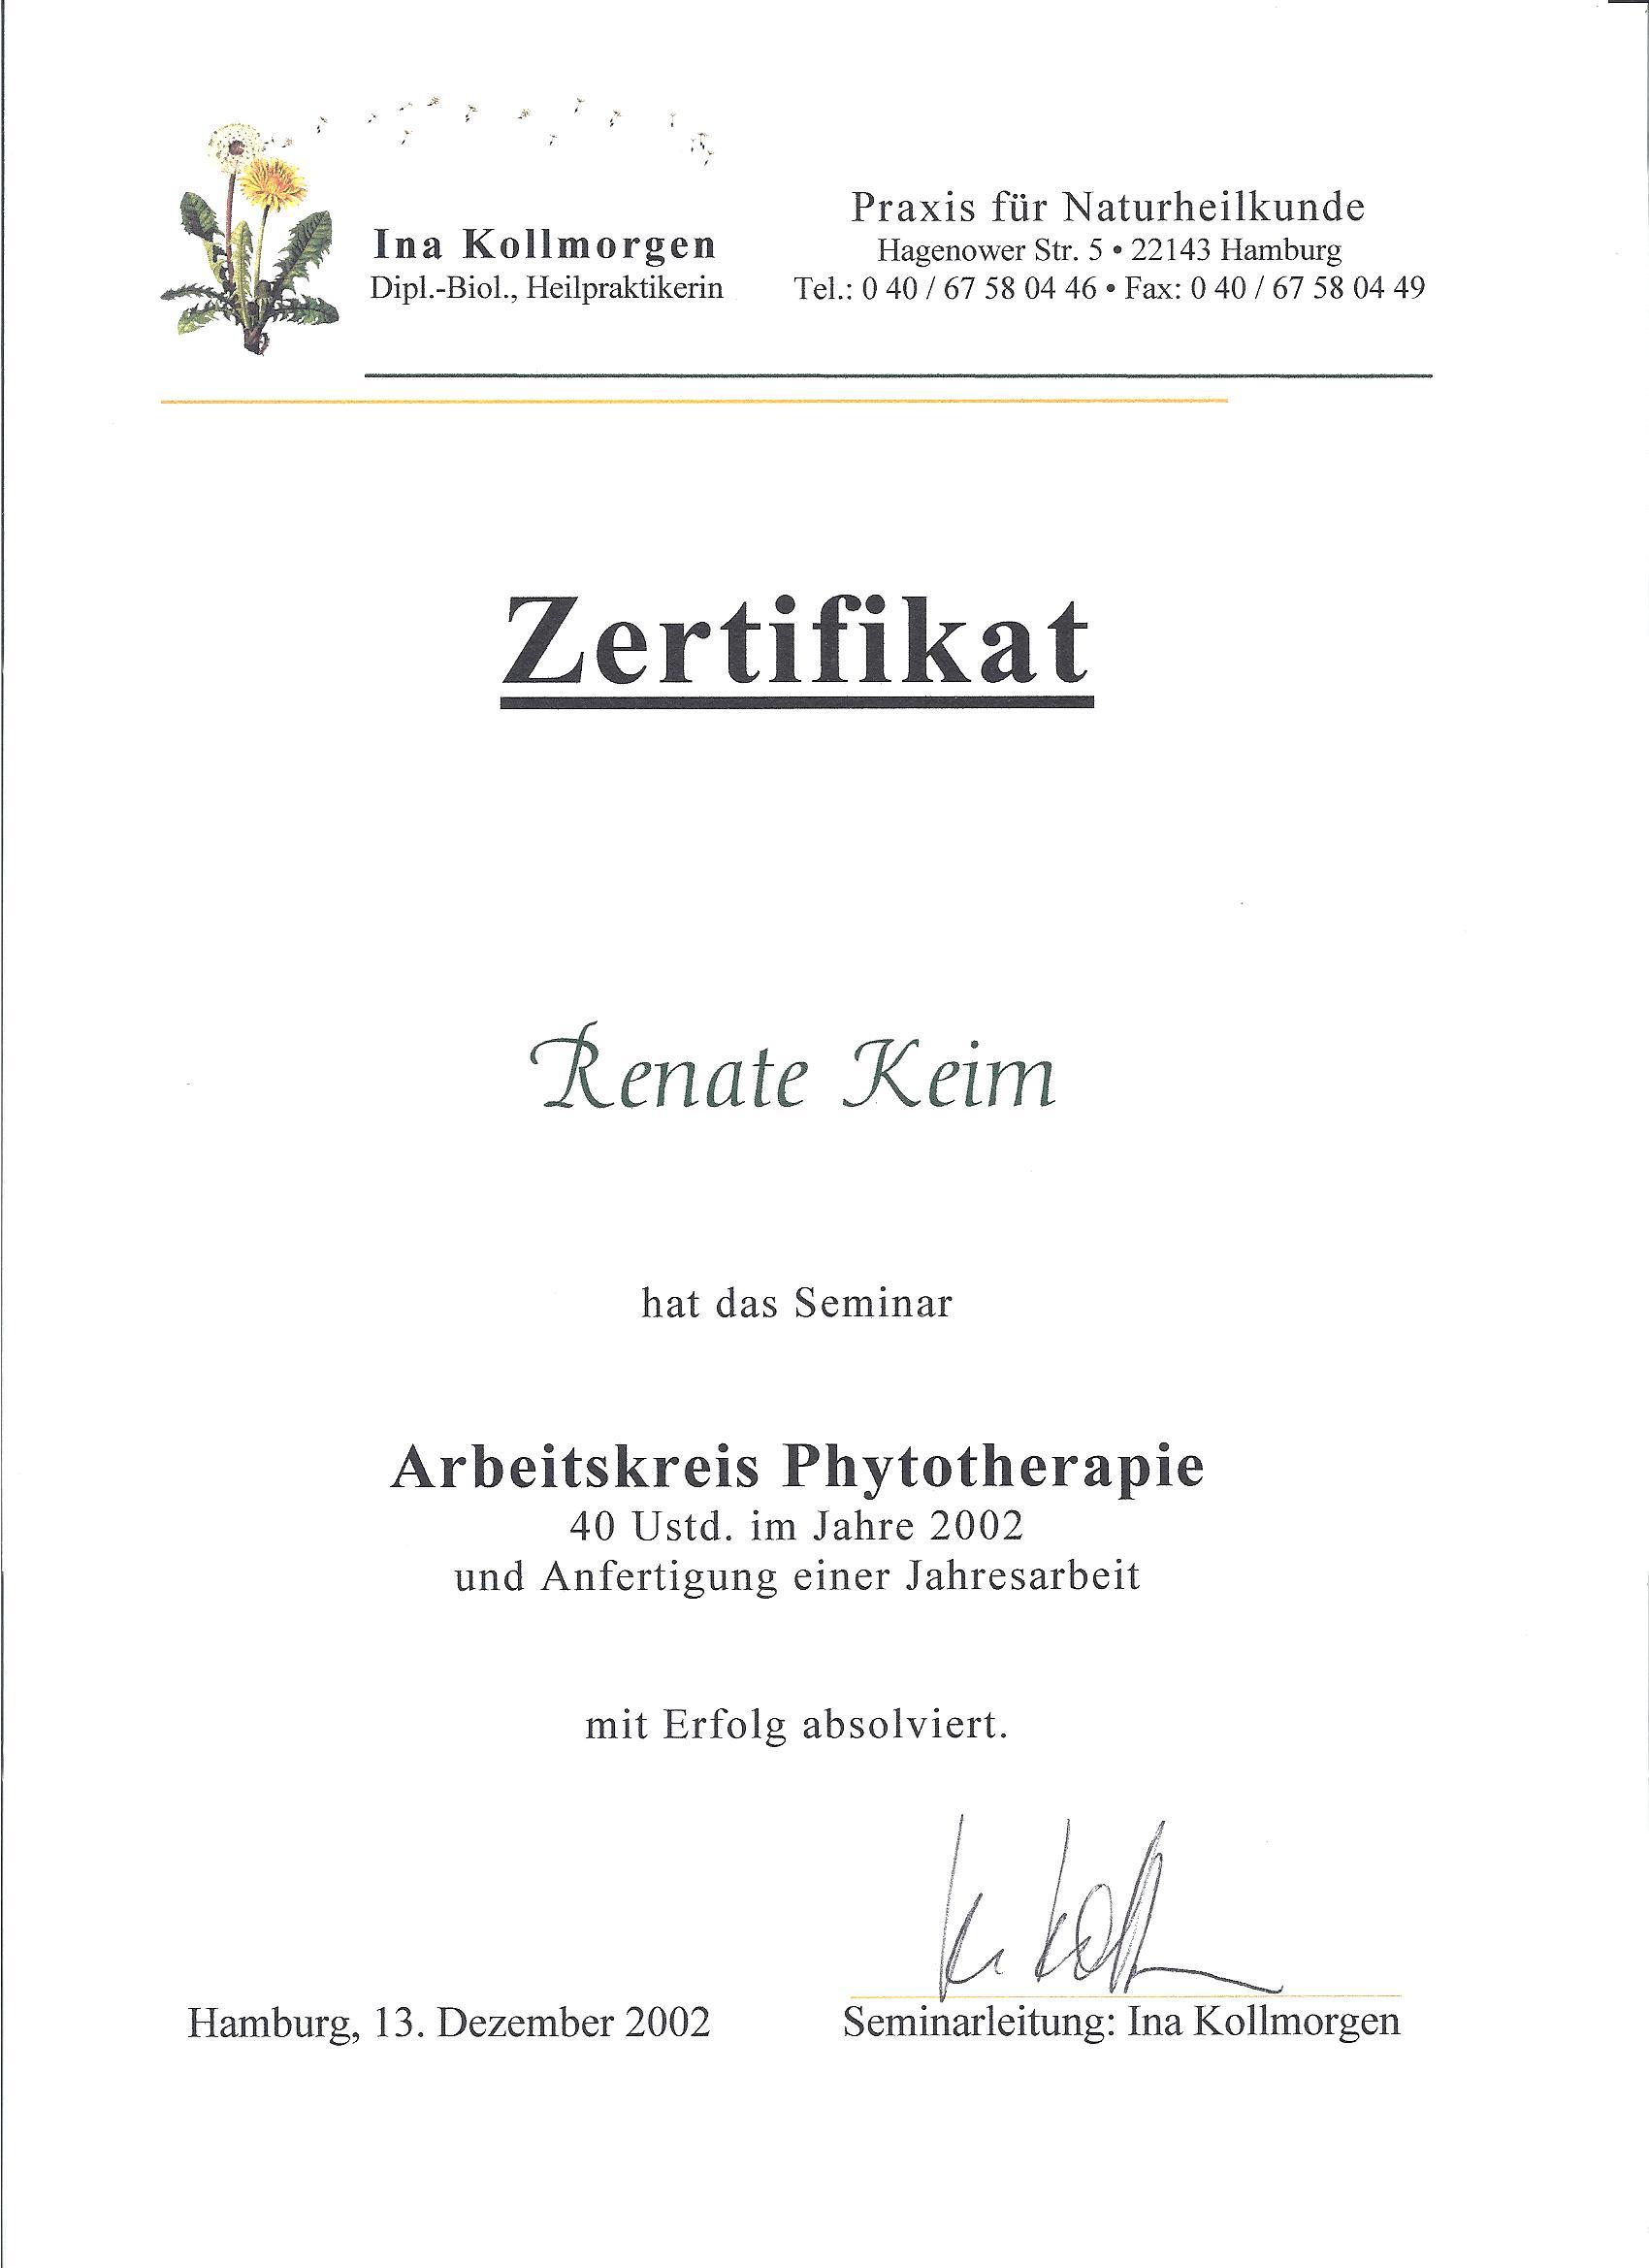 Arbeitskreis Phytotherapie 2002